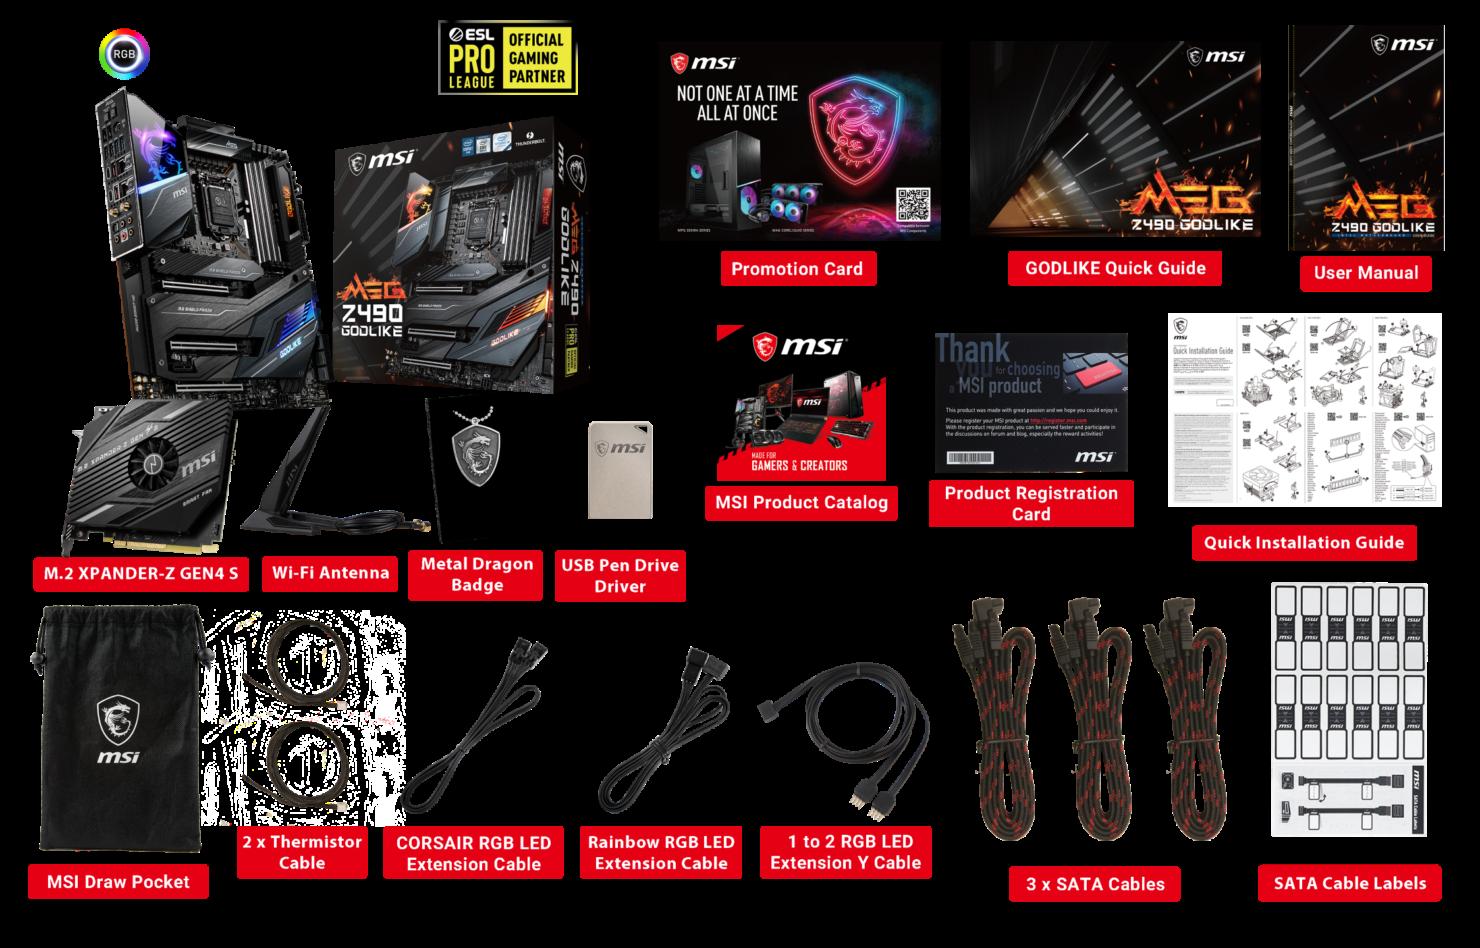 msi-meg_z490_godlike-product_photo-accessories-text-custom